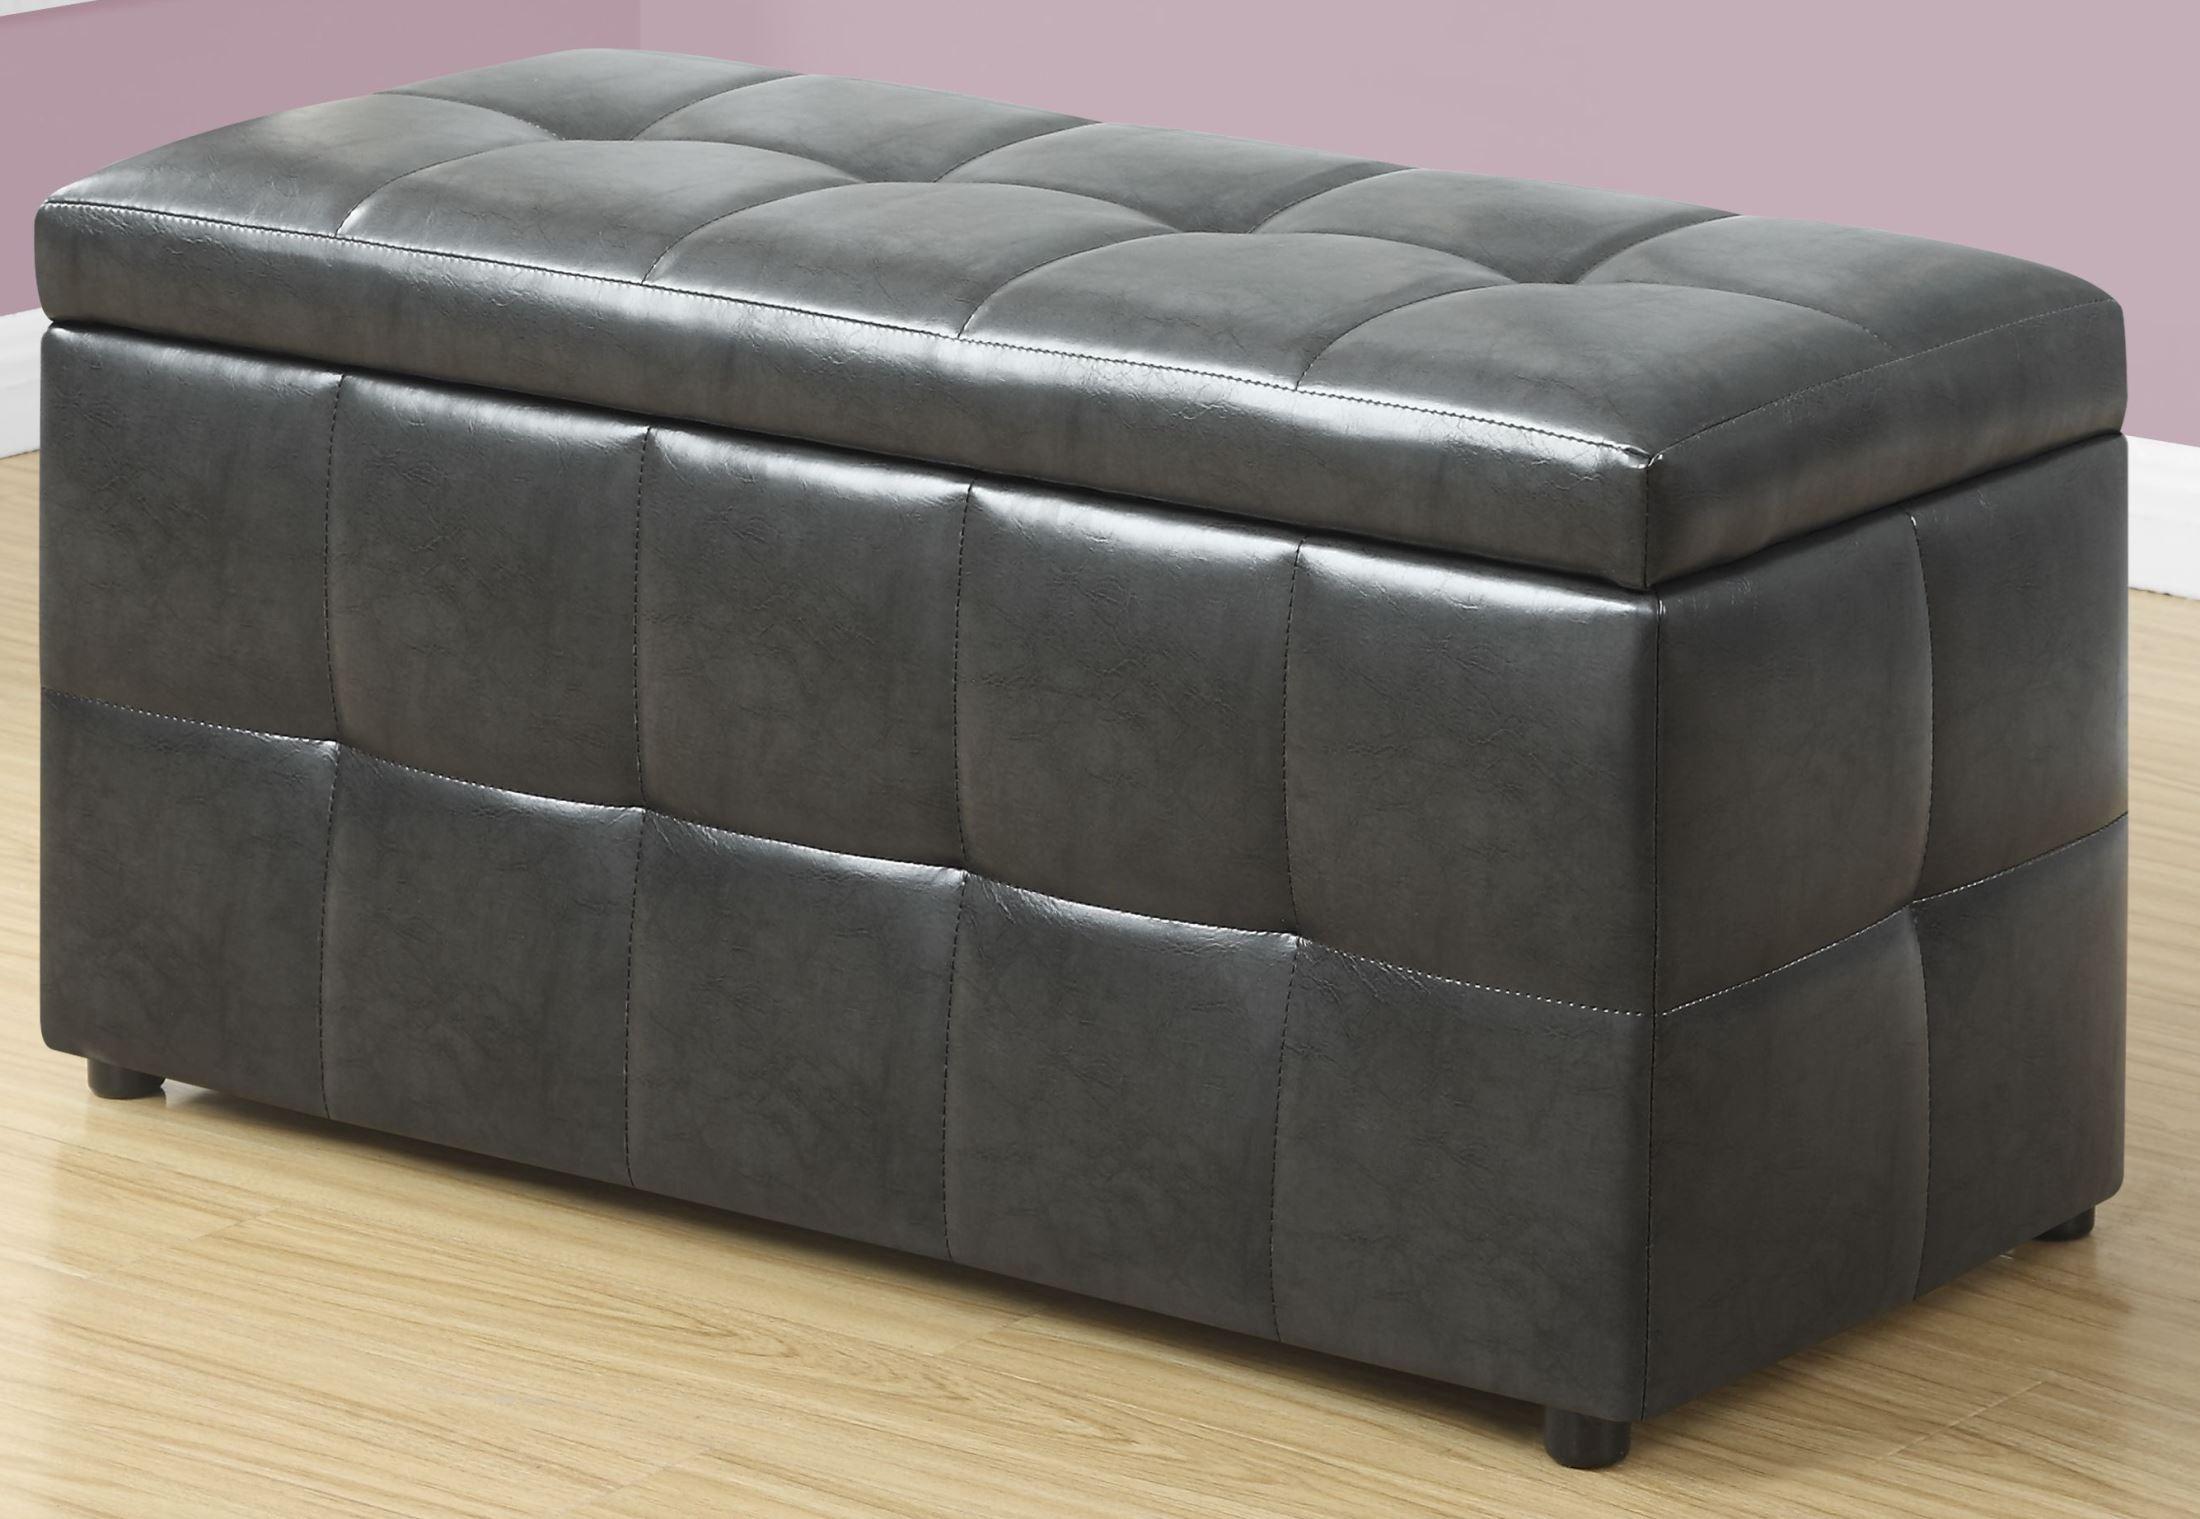 Charcoal Grey Leather Storage Ottoman, 8987, Monarch